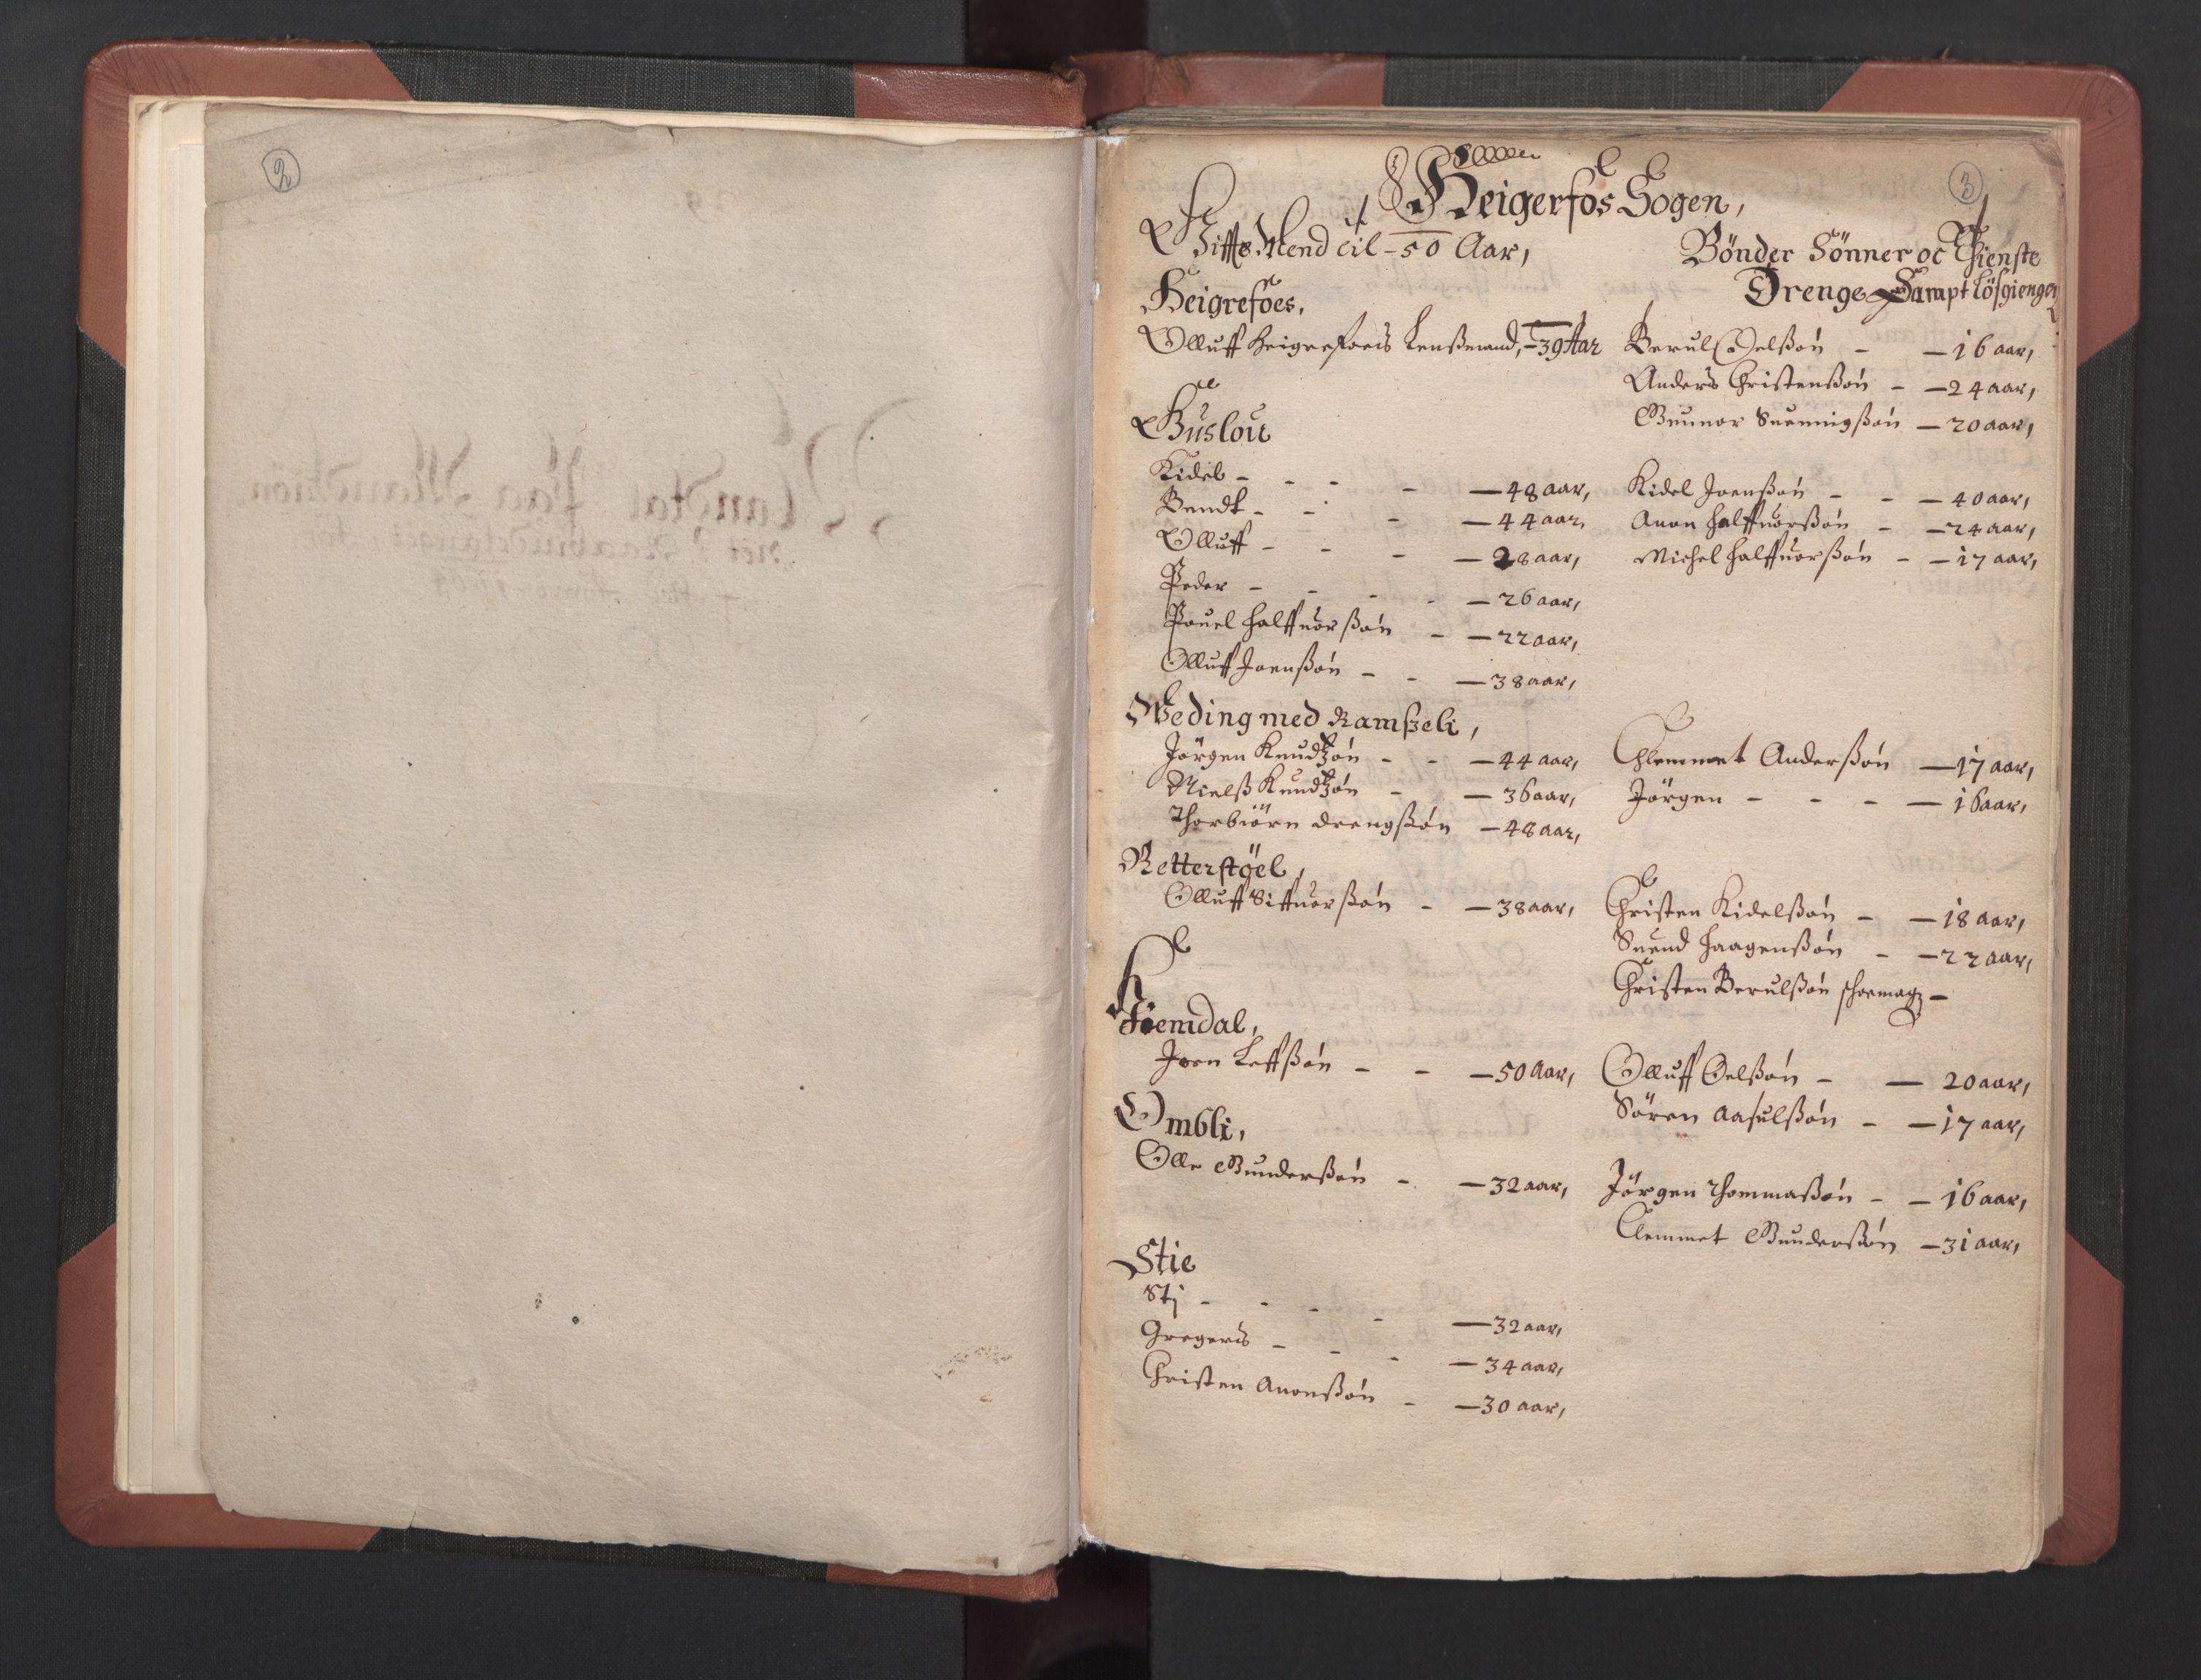 RA, Fogdenes og sorenskrivernes manntall 1664-1666, nr. 8: Råbyggelaget fogderi, 1664-1665, s. 2-3